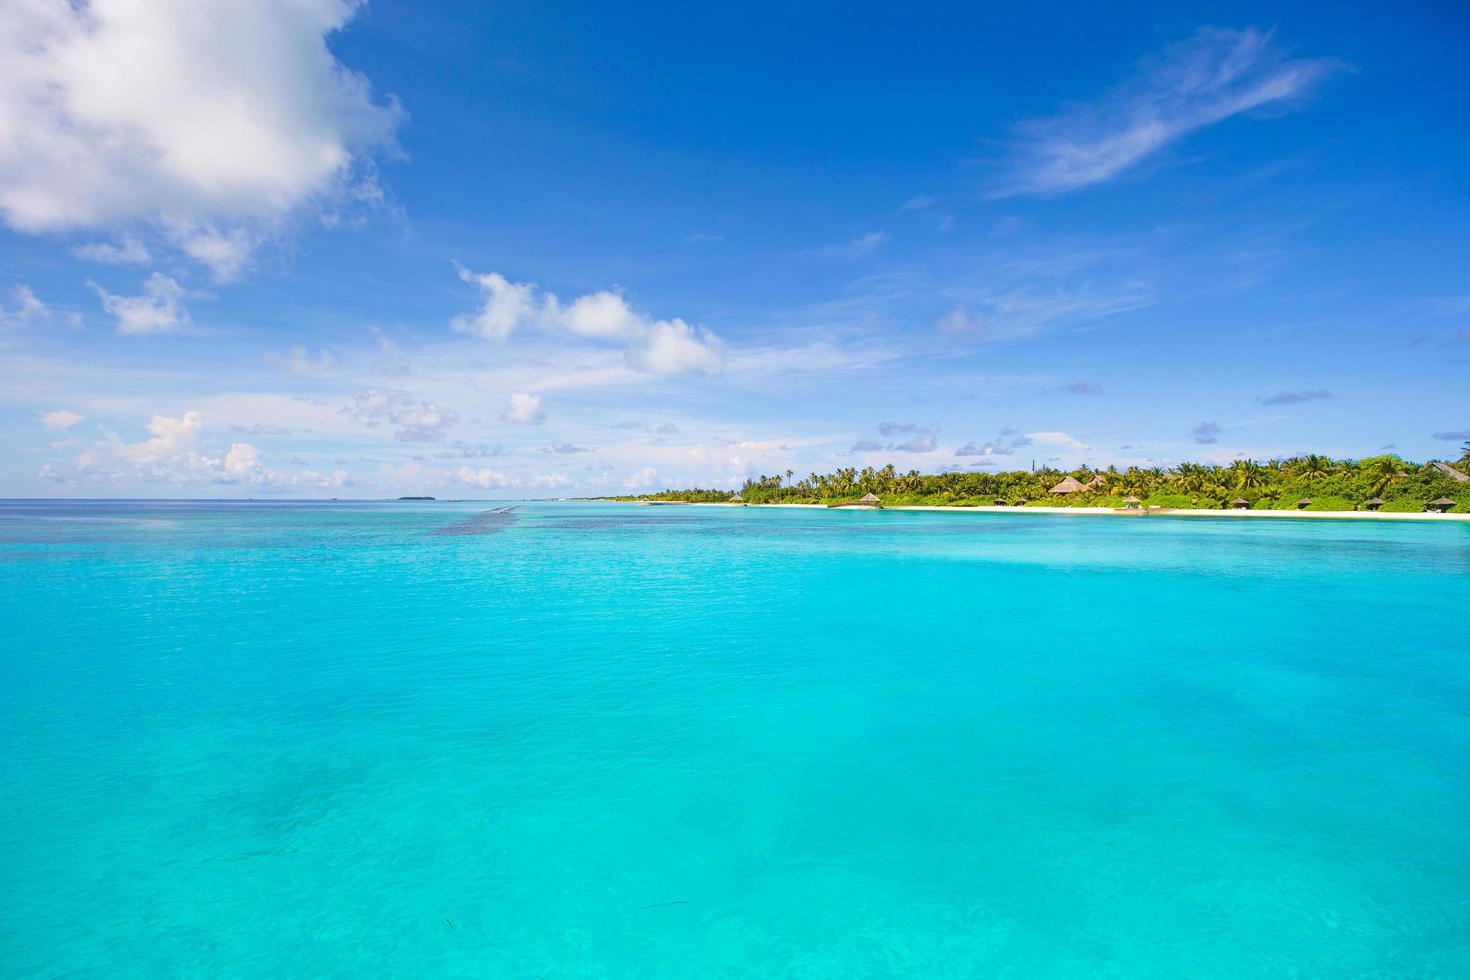 Tropical blue ocean and island photo